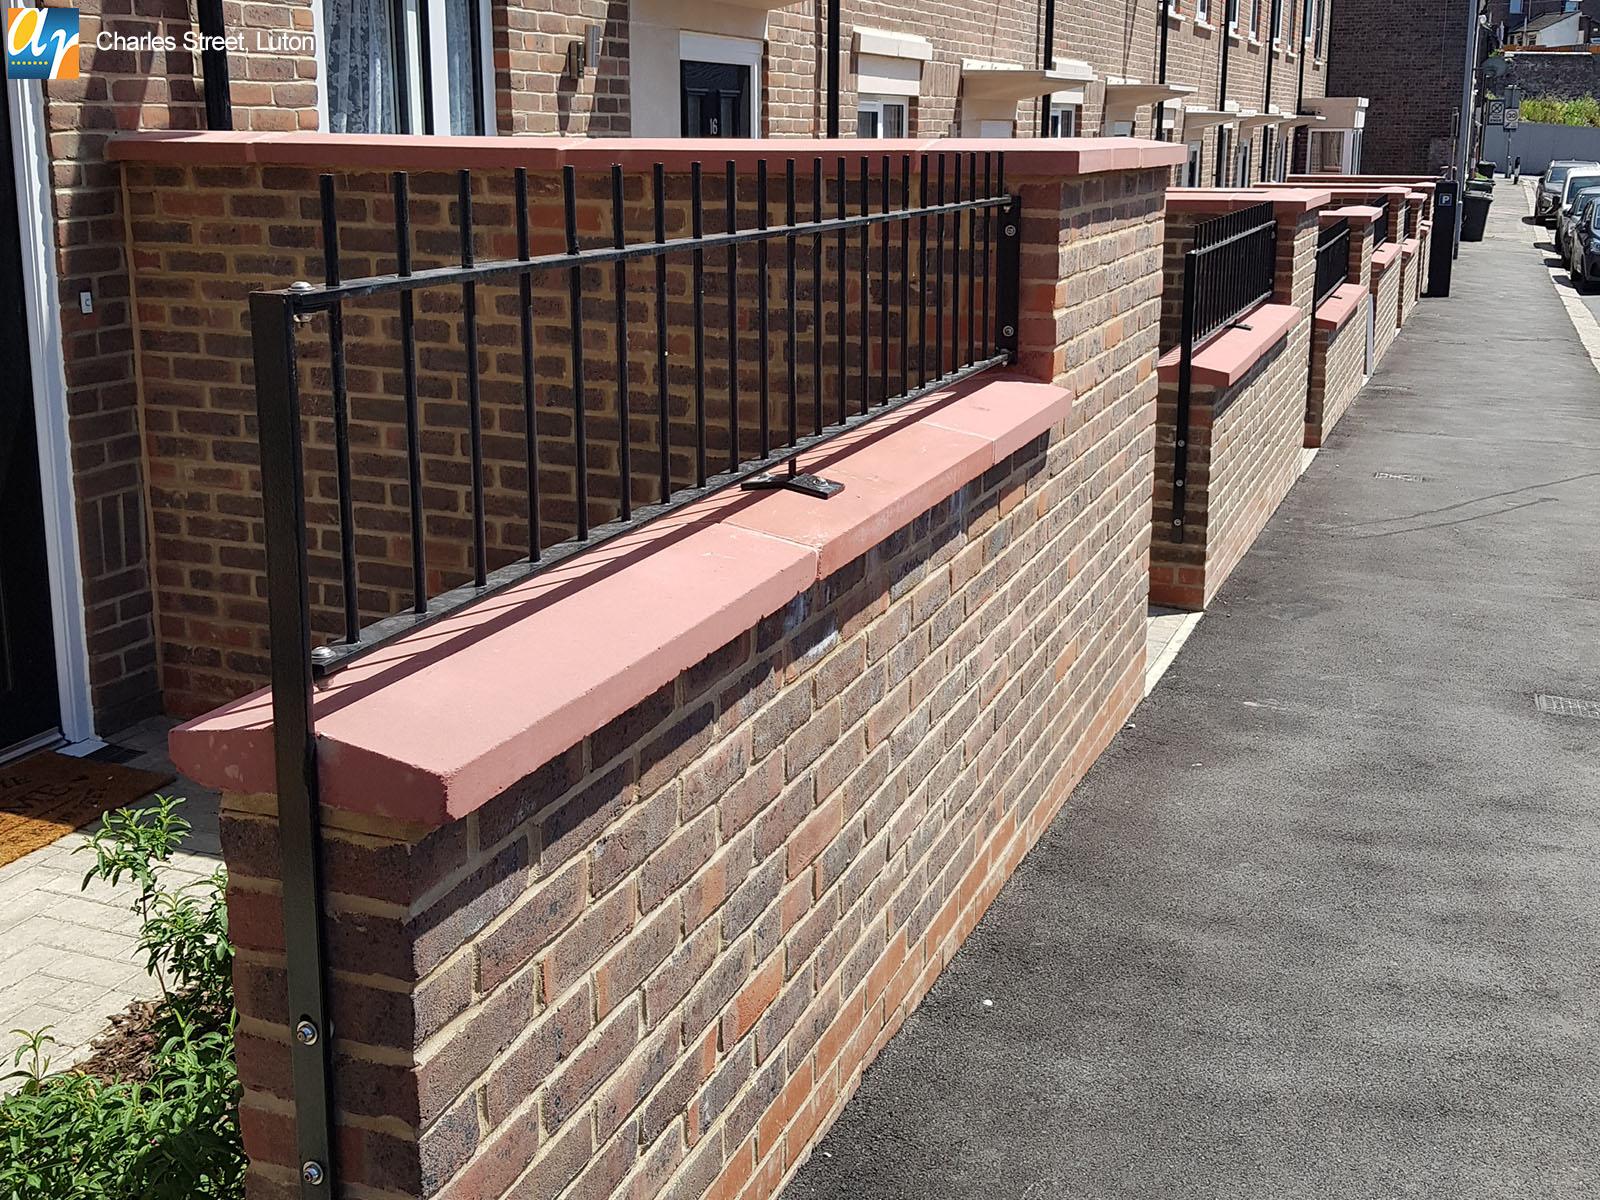 Charles Street Luton Metal Railings